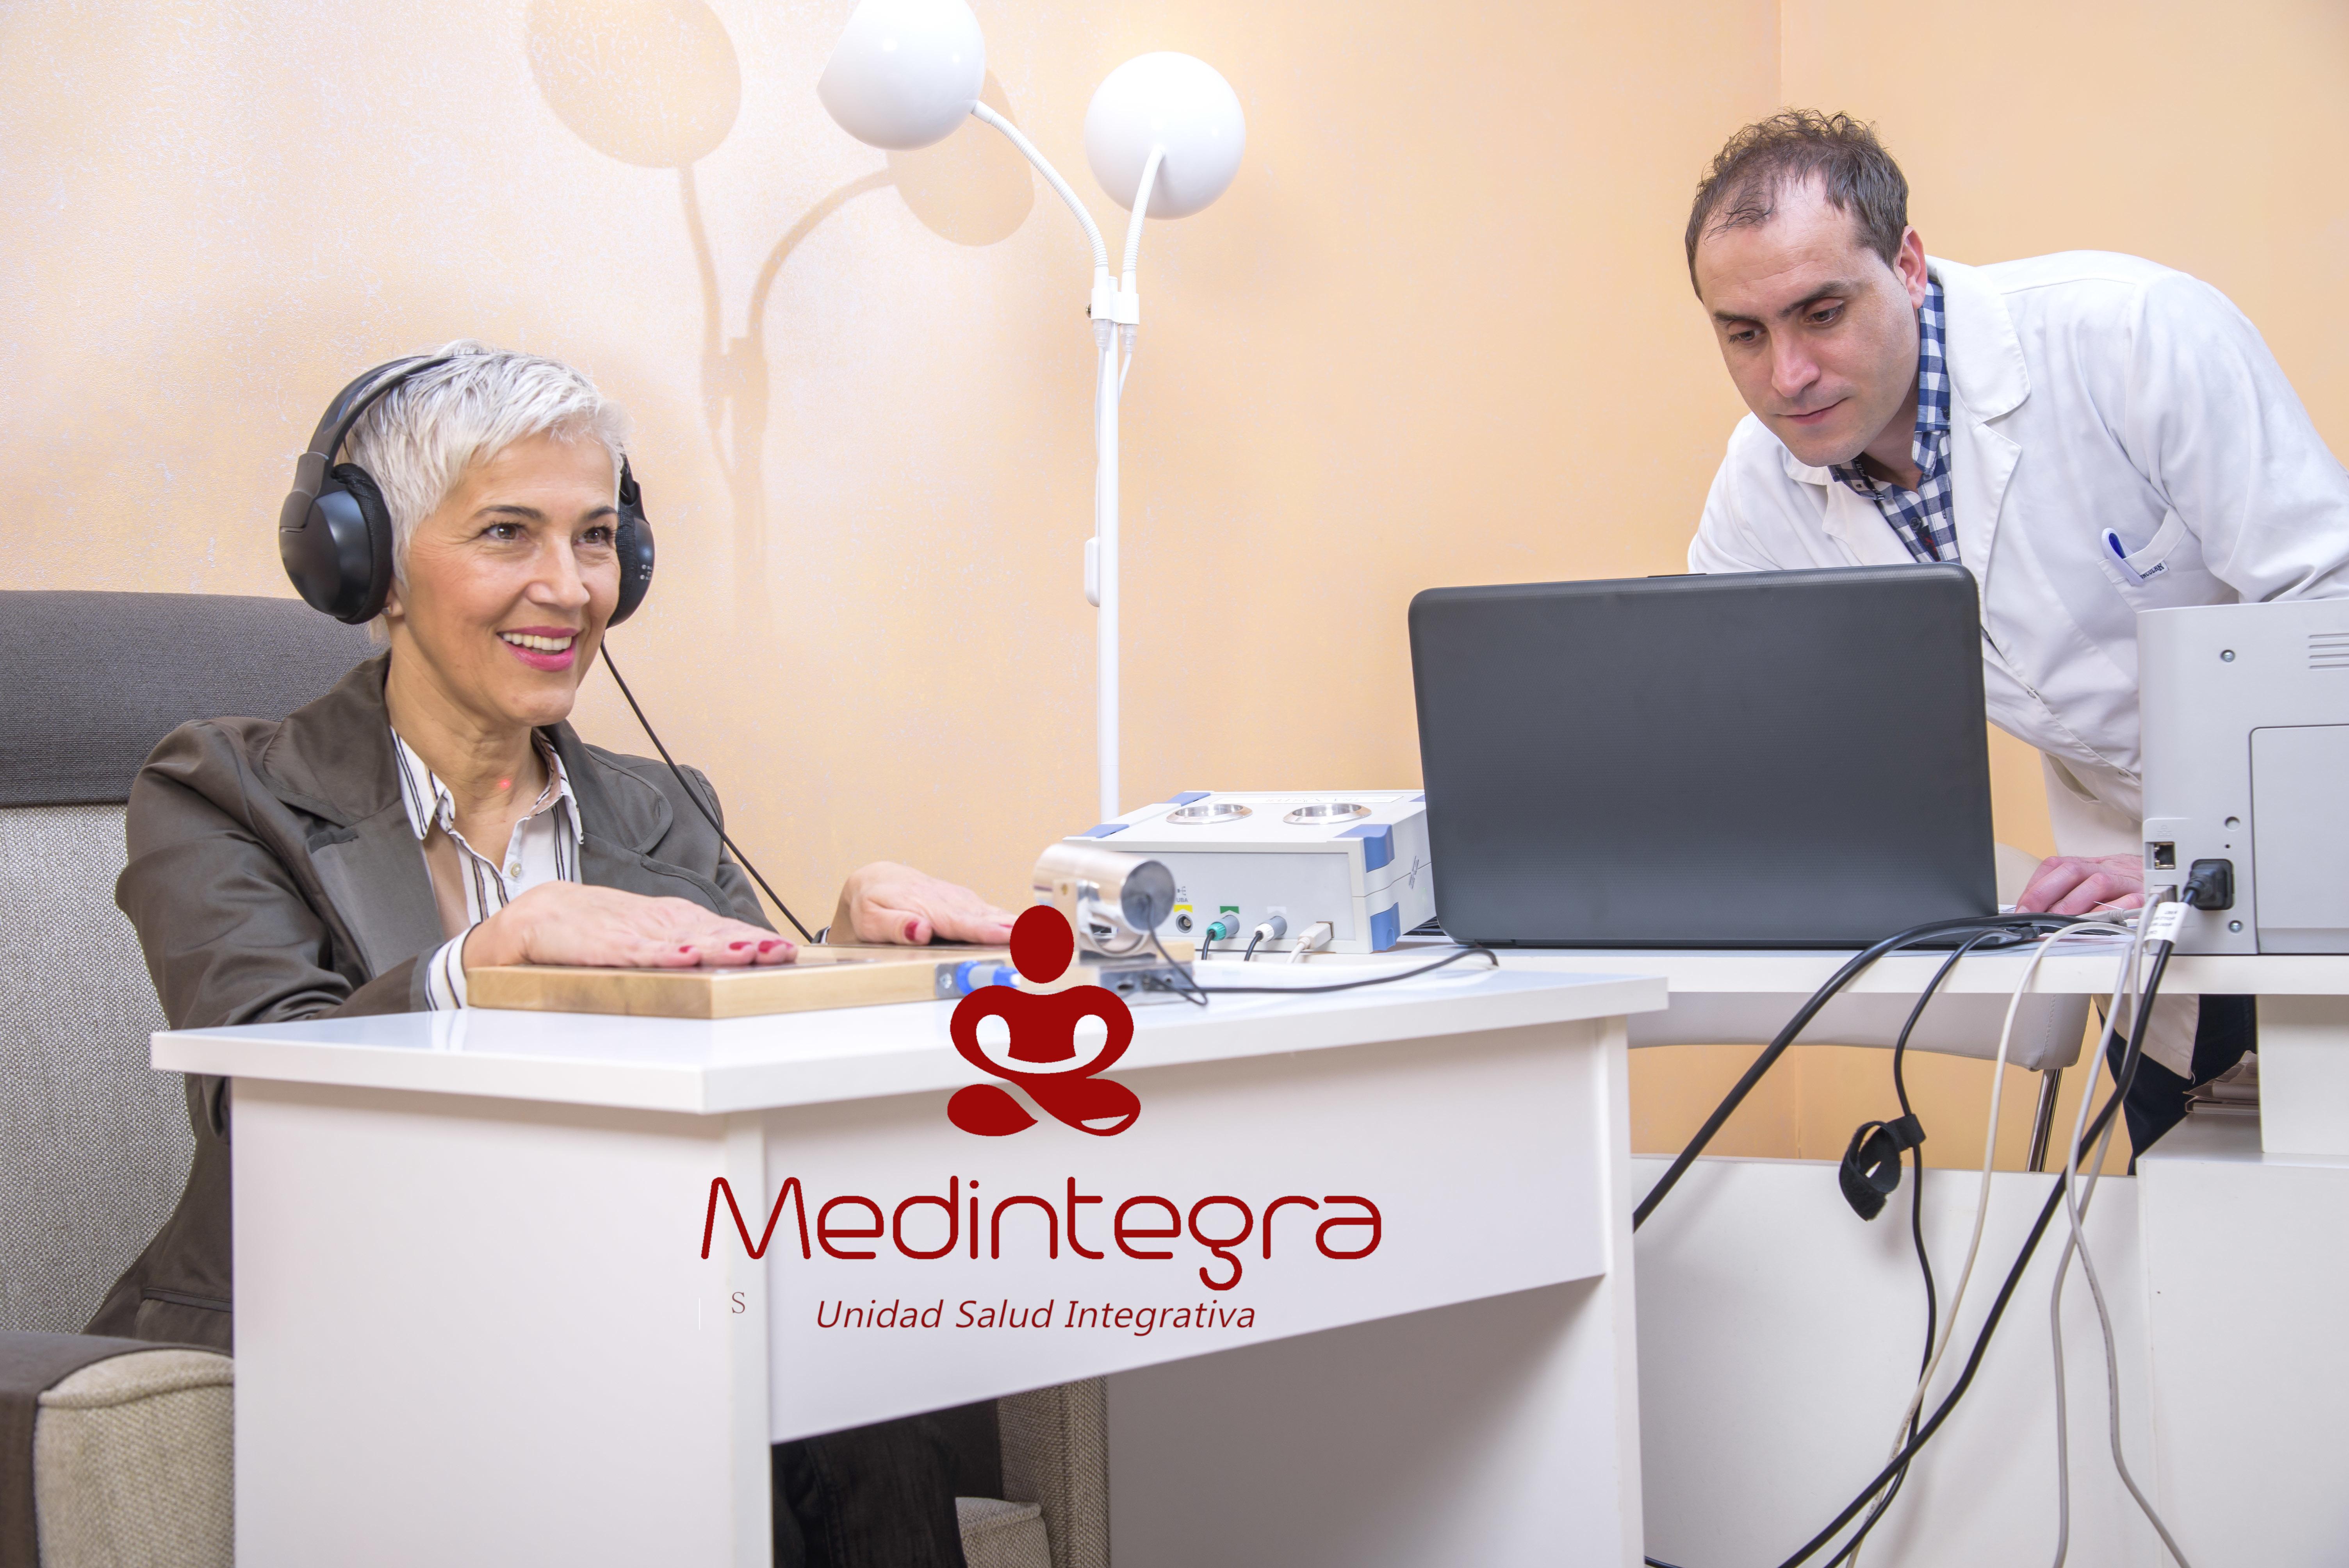 biorresonancia-medintegra-2